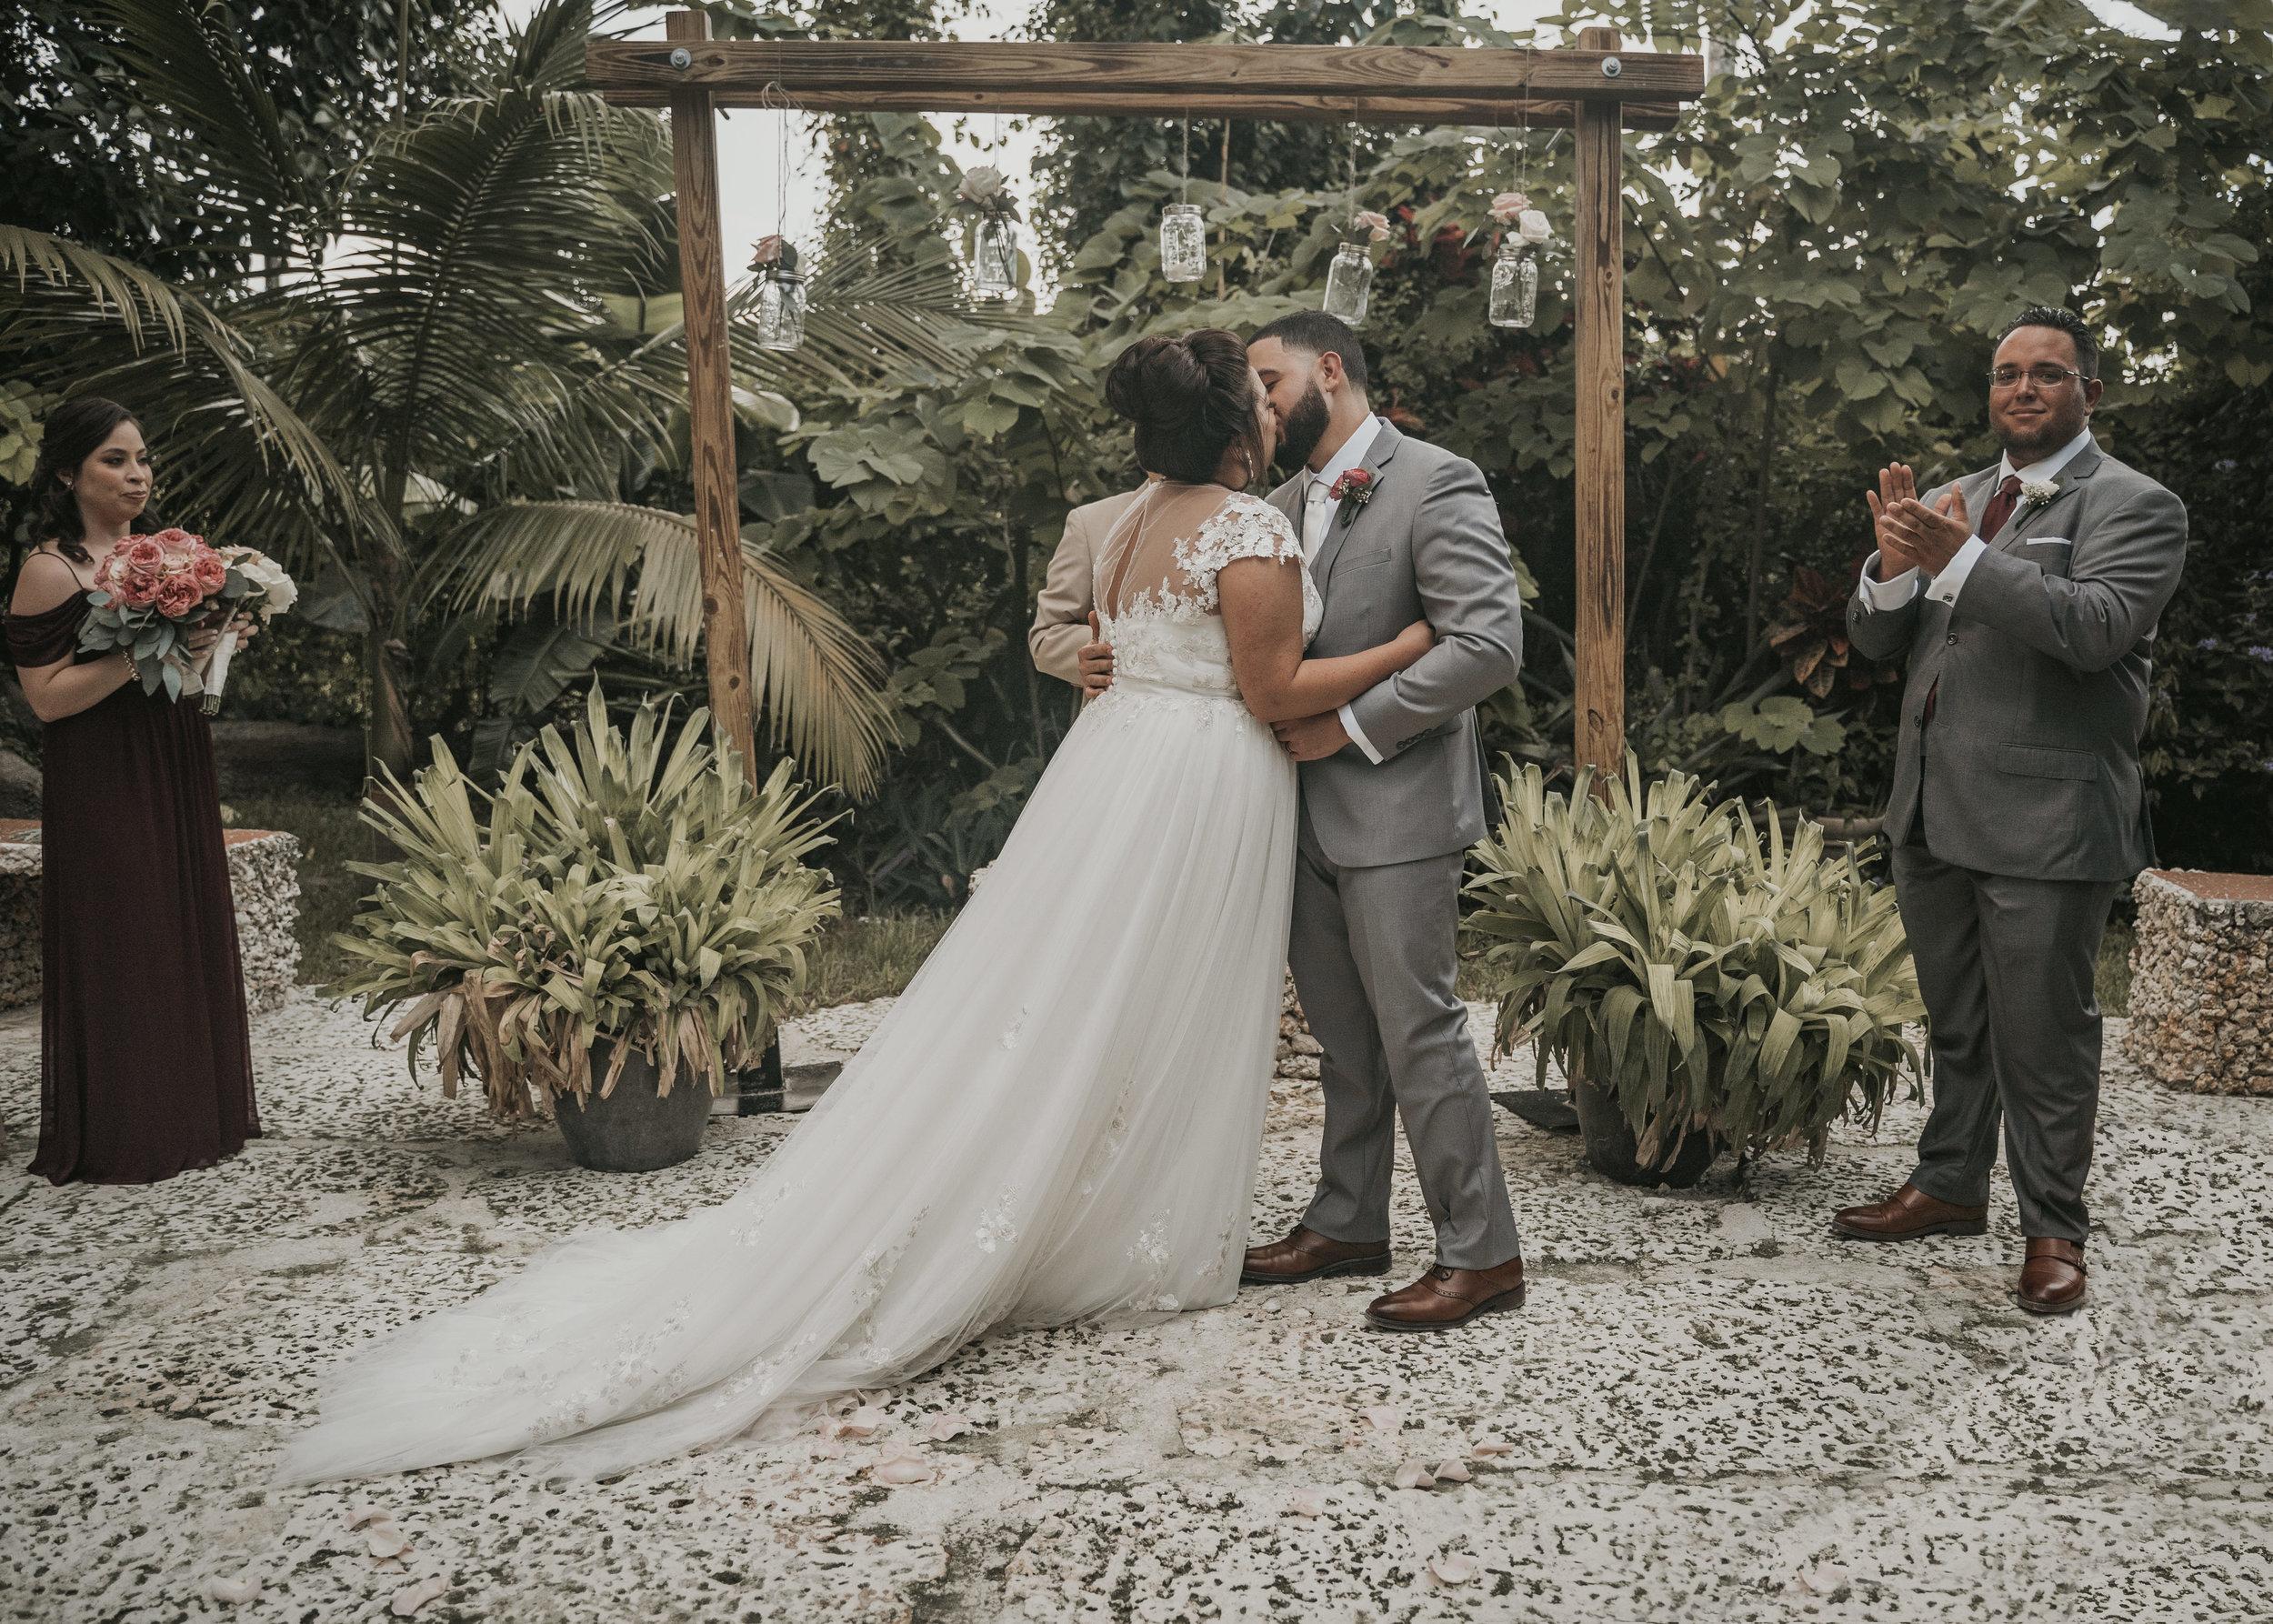 289MICHI&GABEWEDDINGDAY(WeddingFinal).jpg